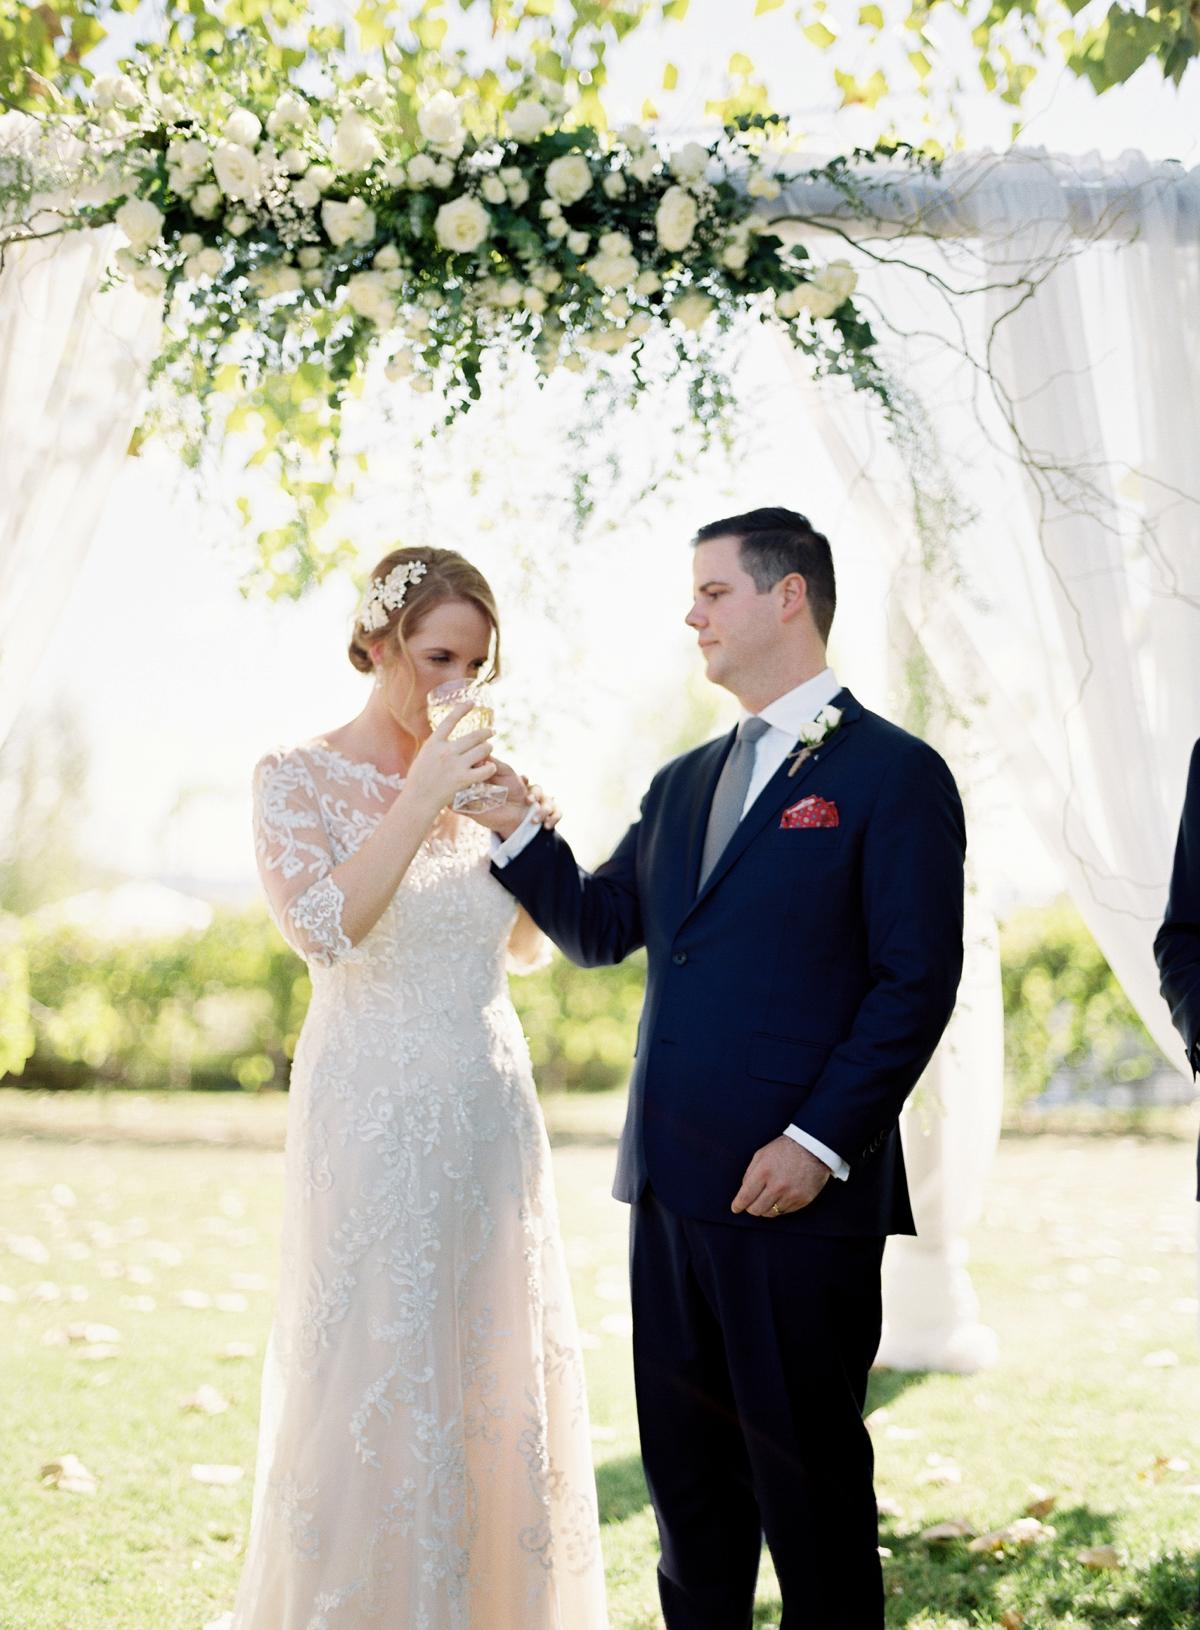 The Vine Grove Mudgee Wedding, Photography by Mr Edwards_1770.jpg